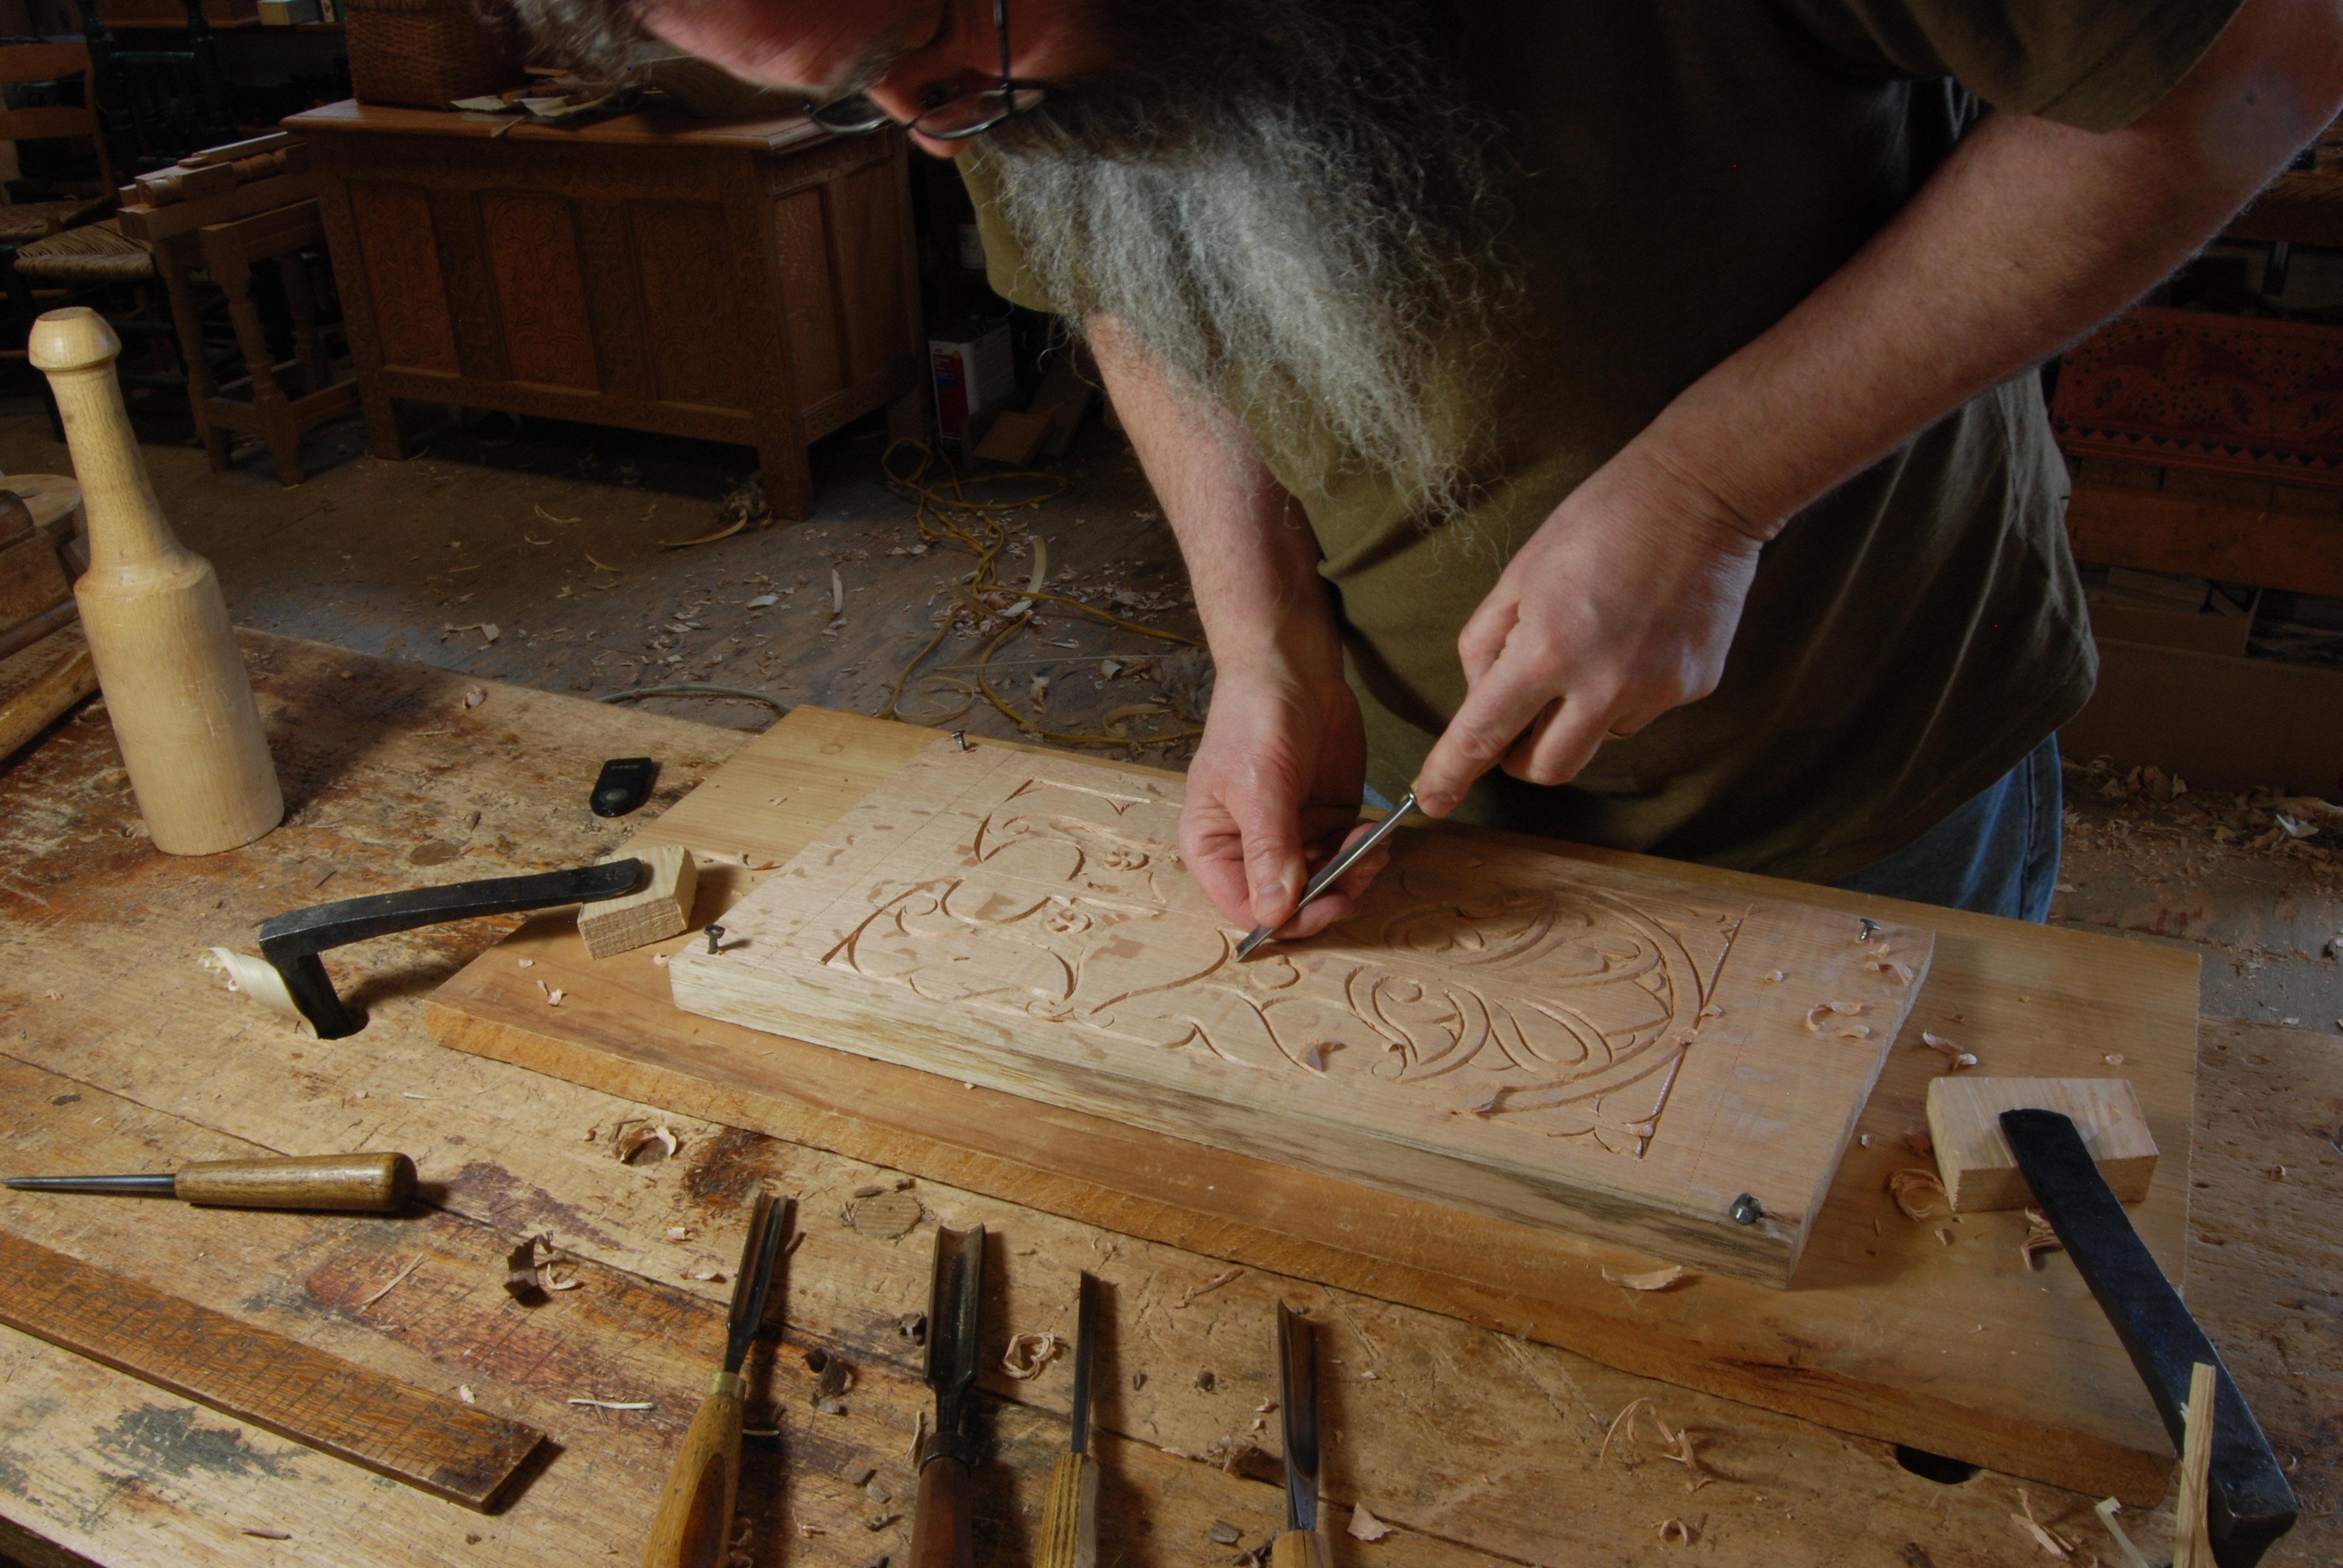 Decoy carving bench plans